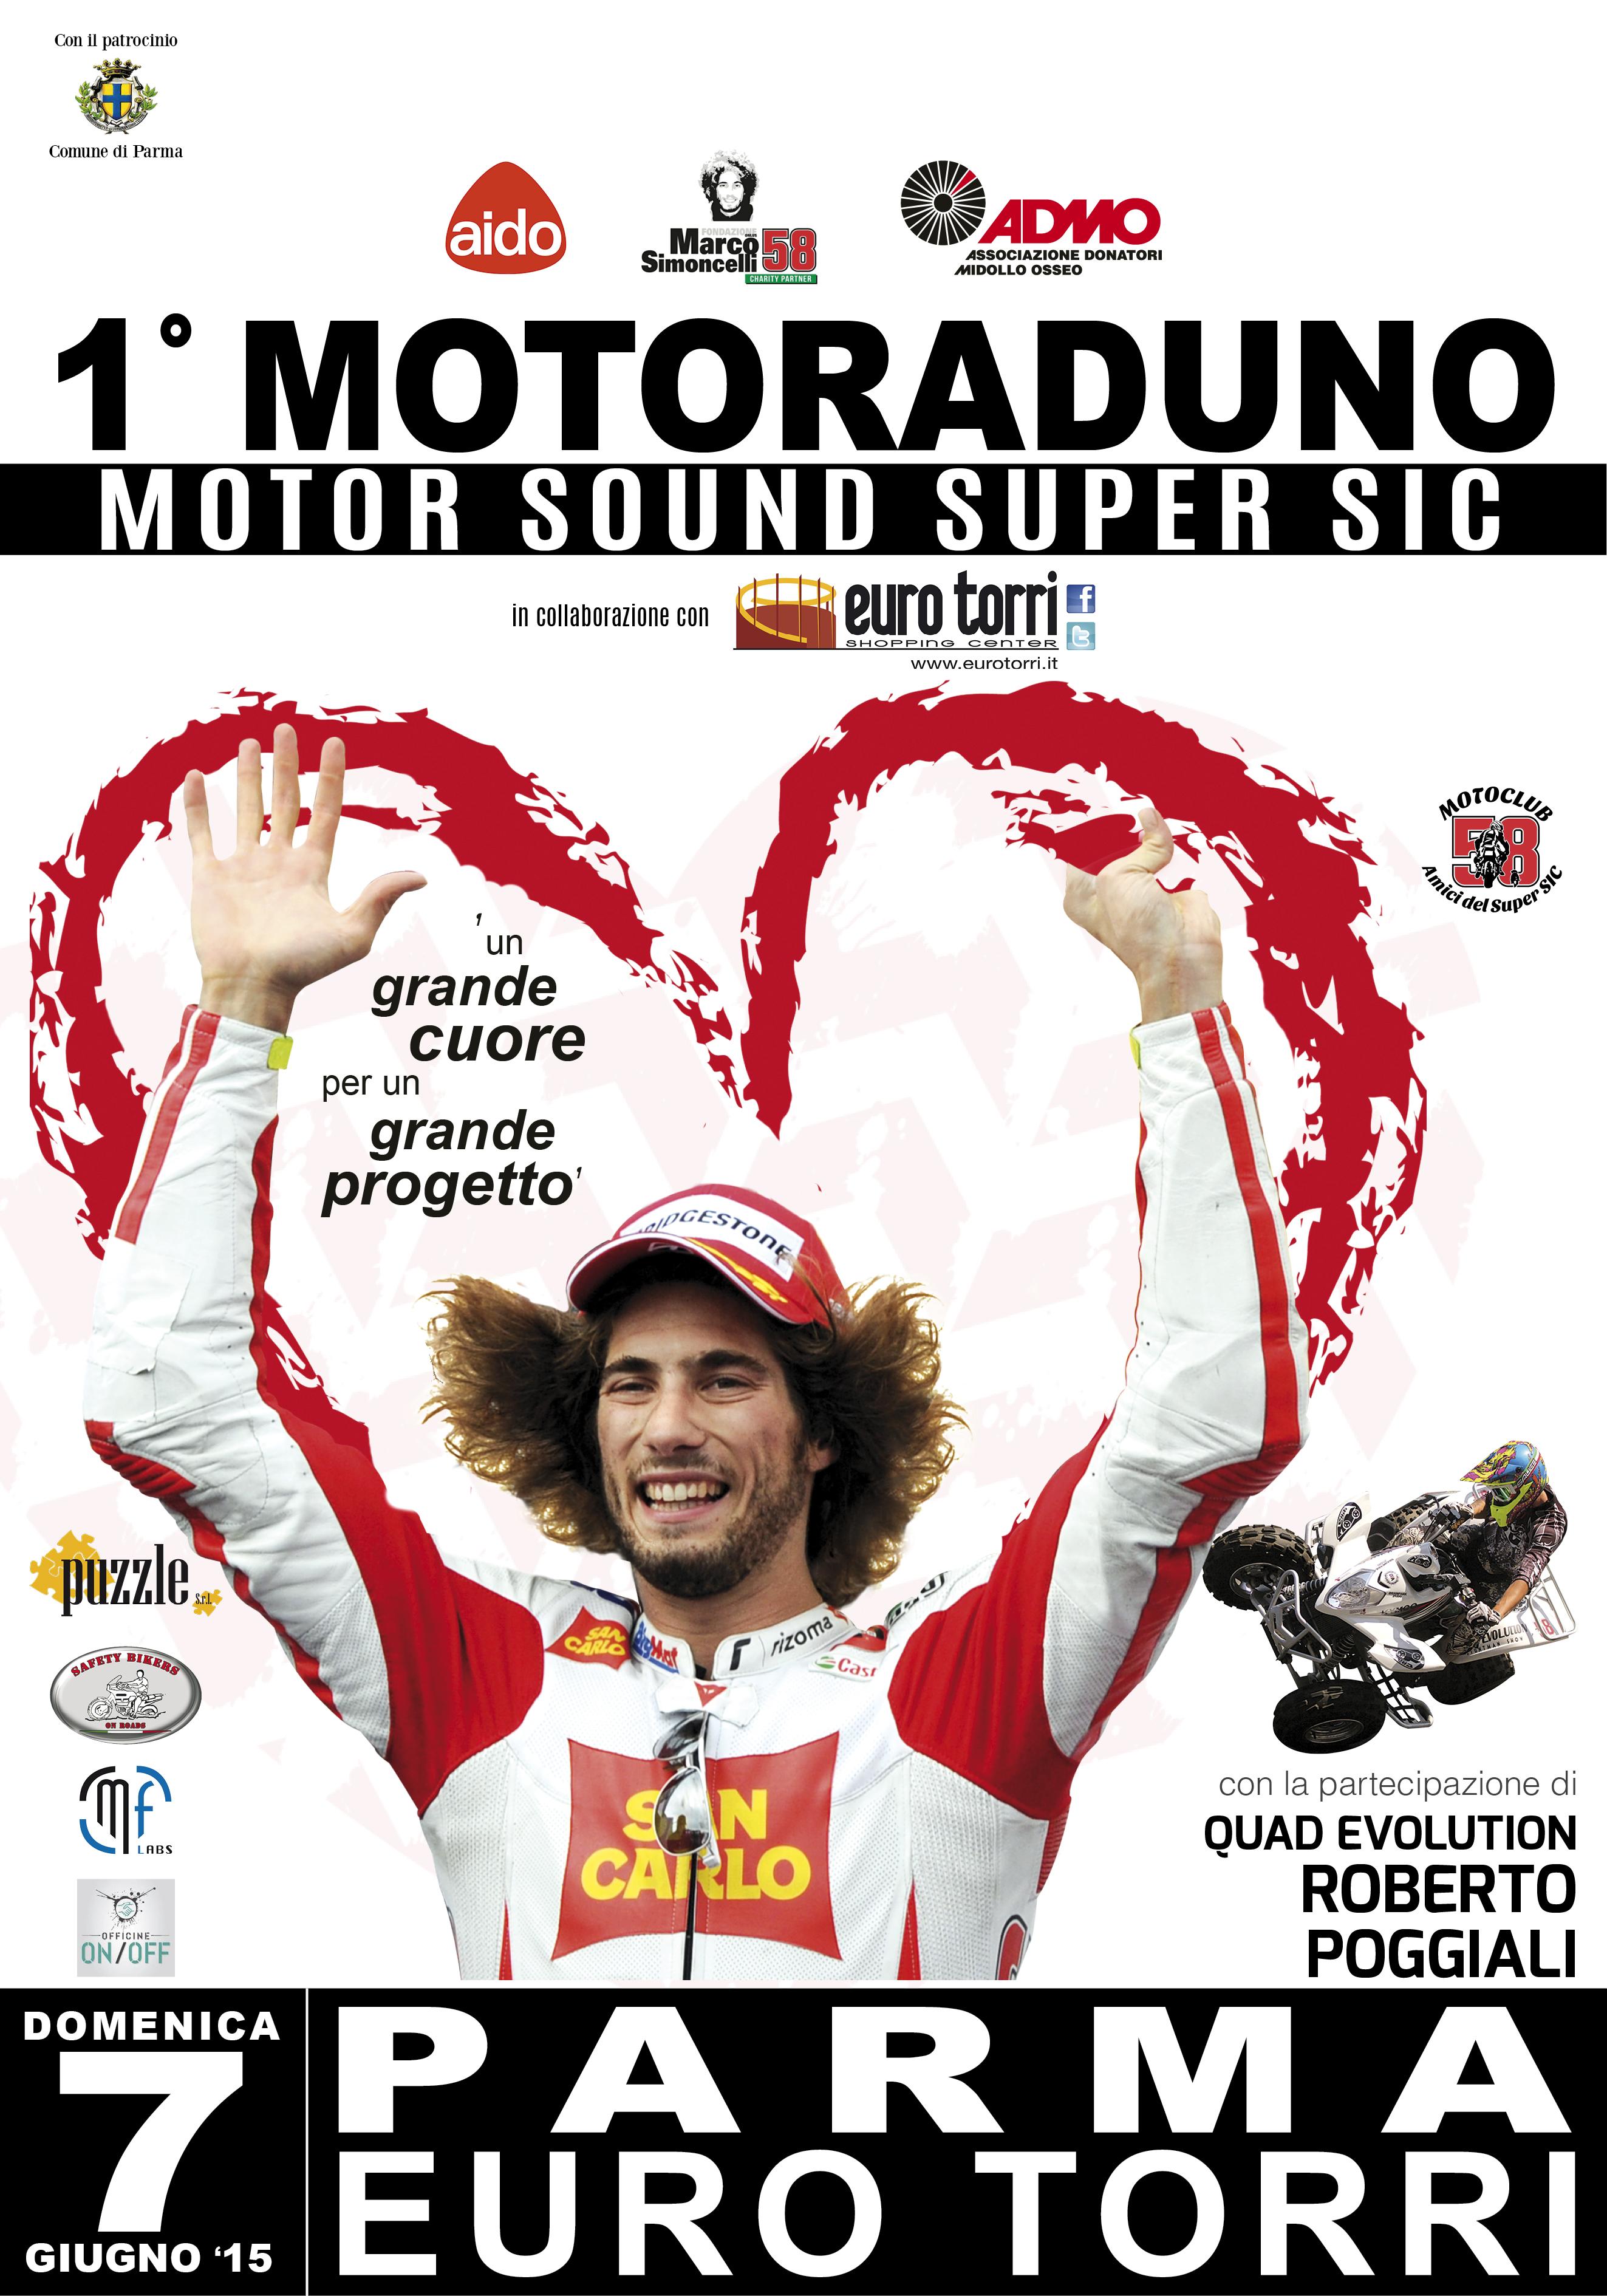 Motor sound a Parma